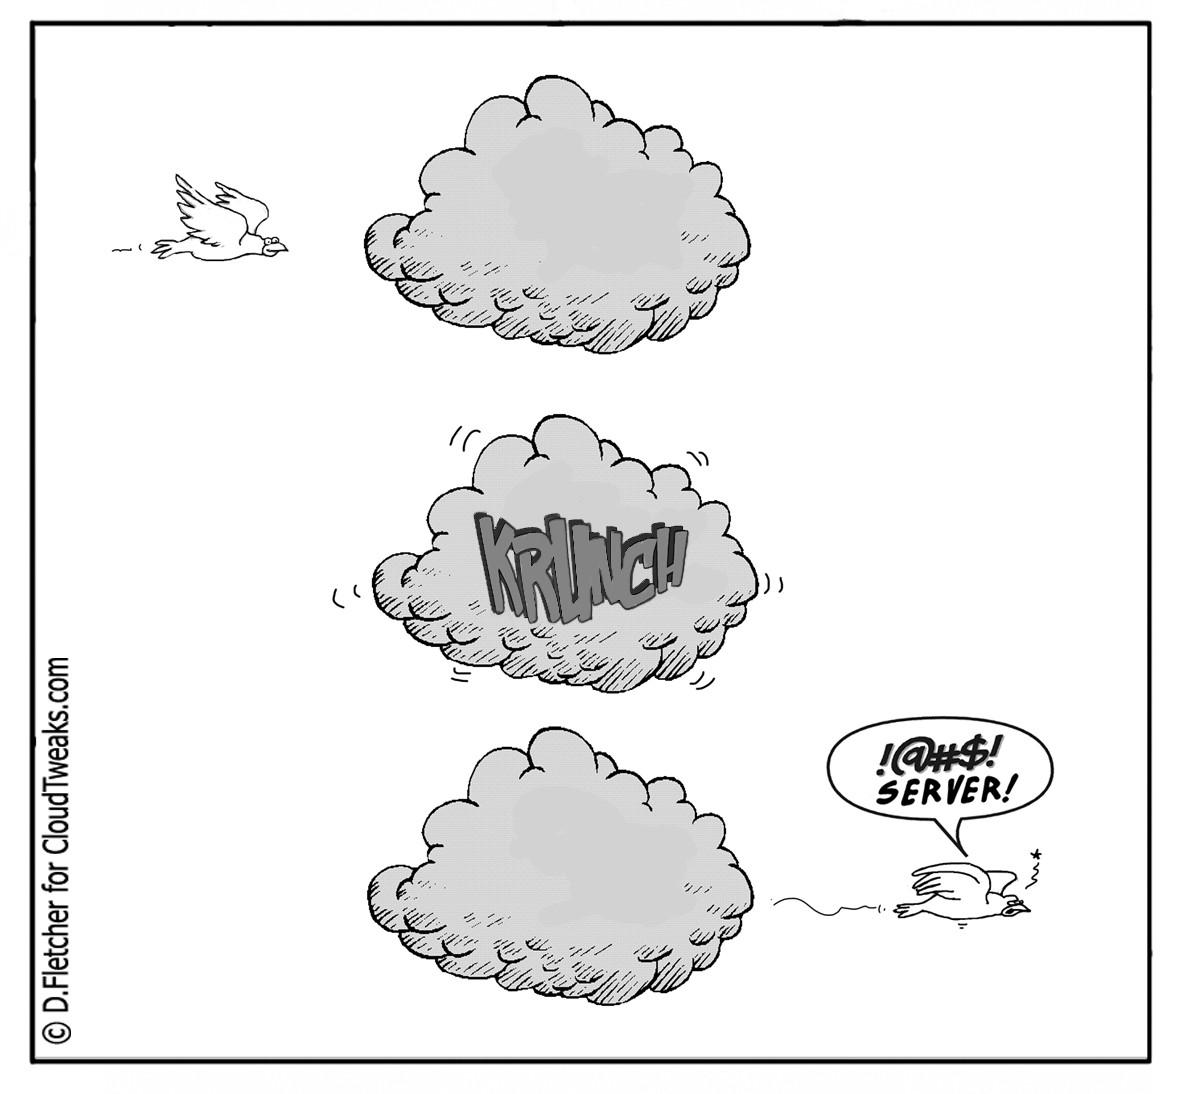 open source server comic